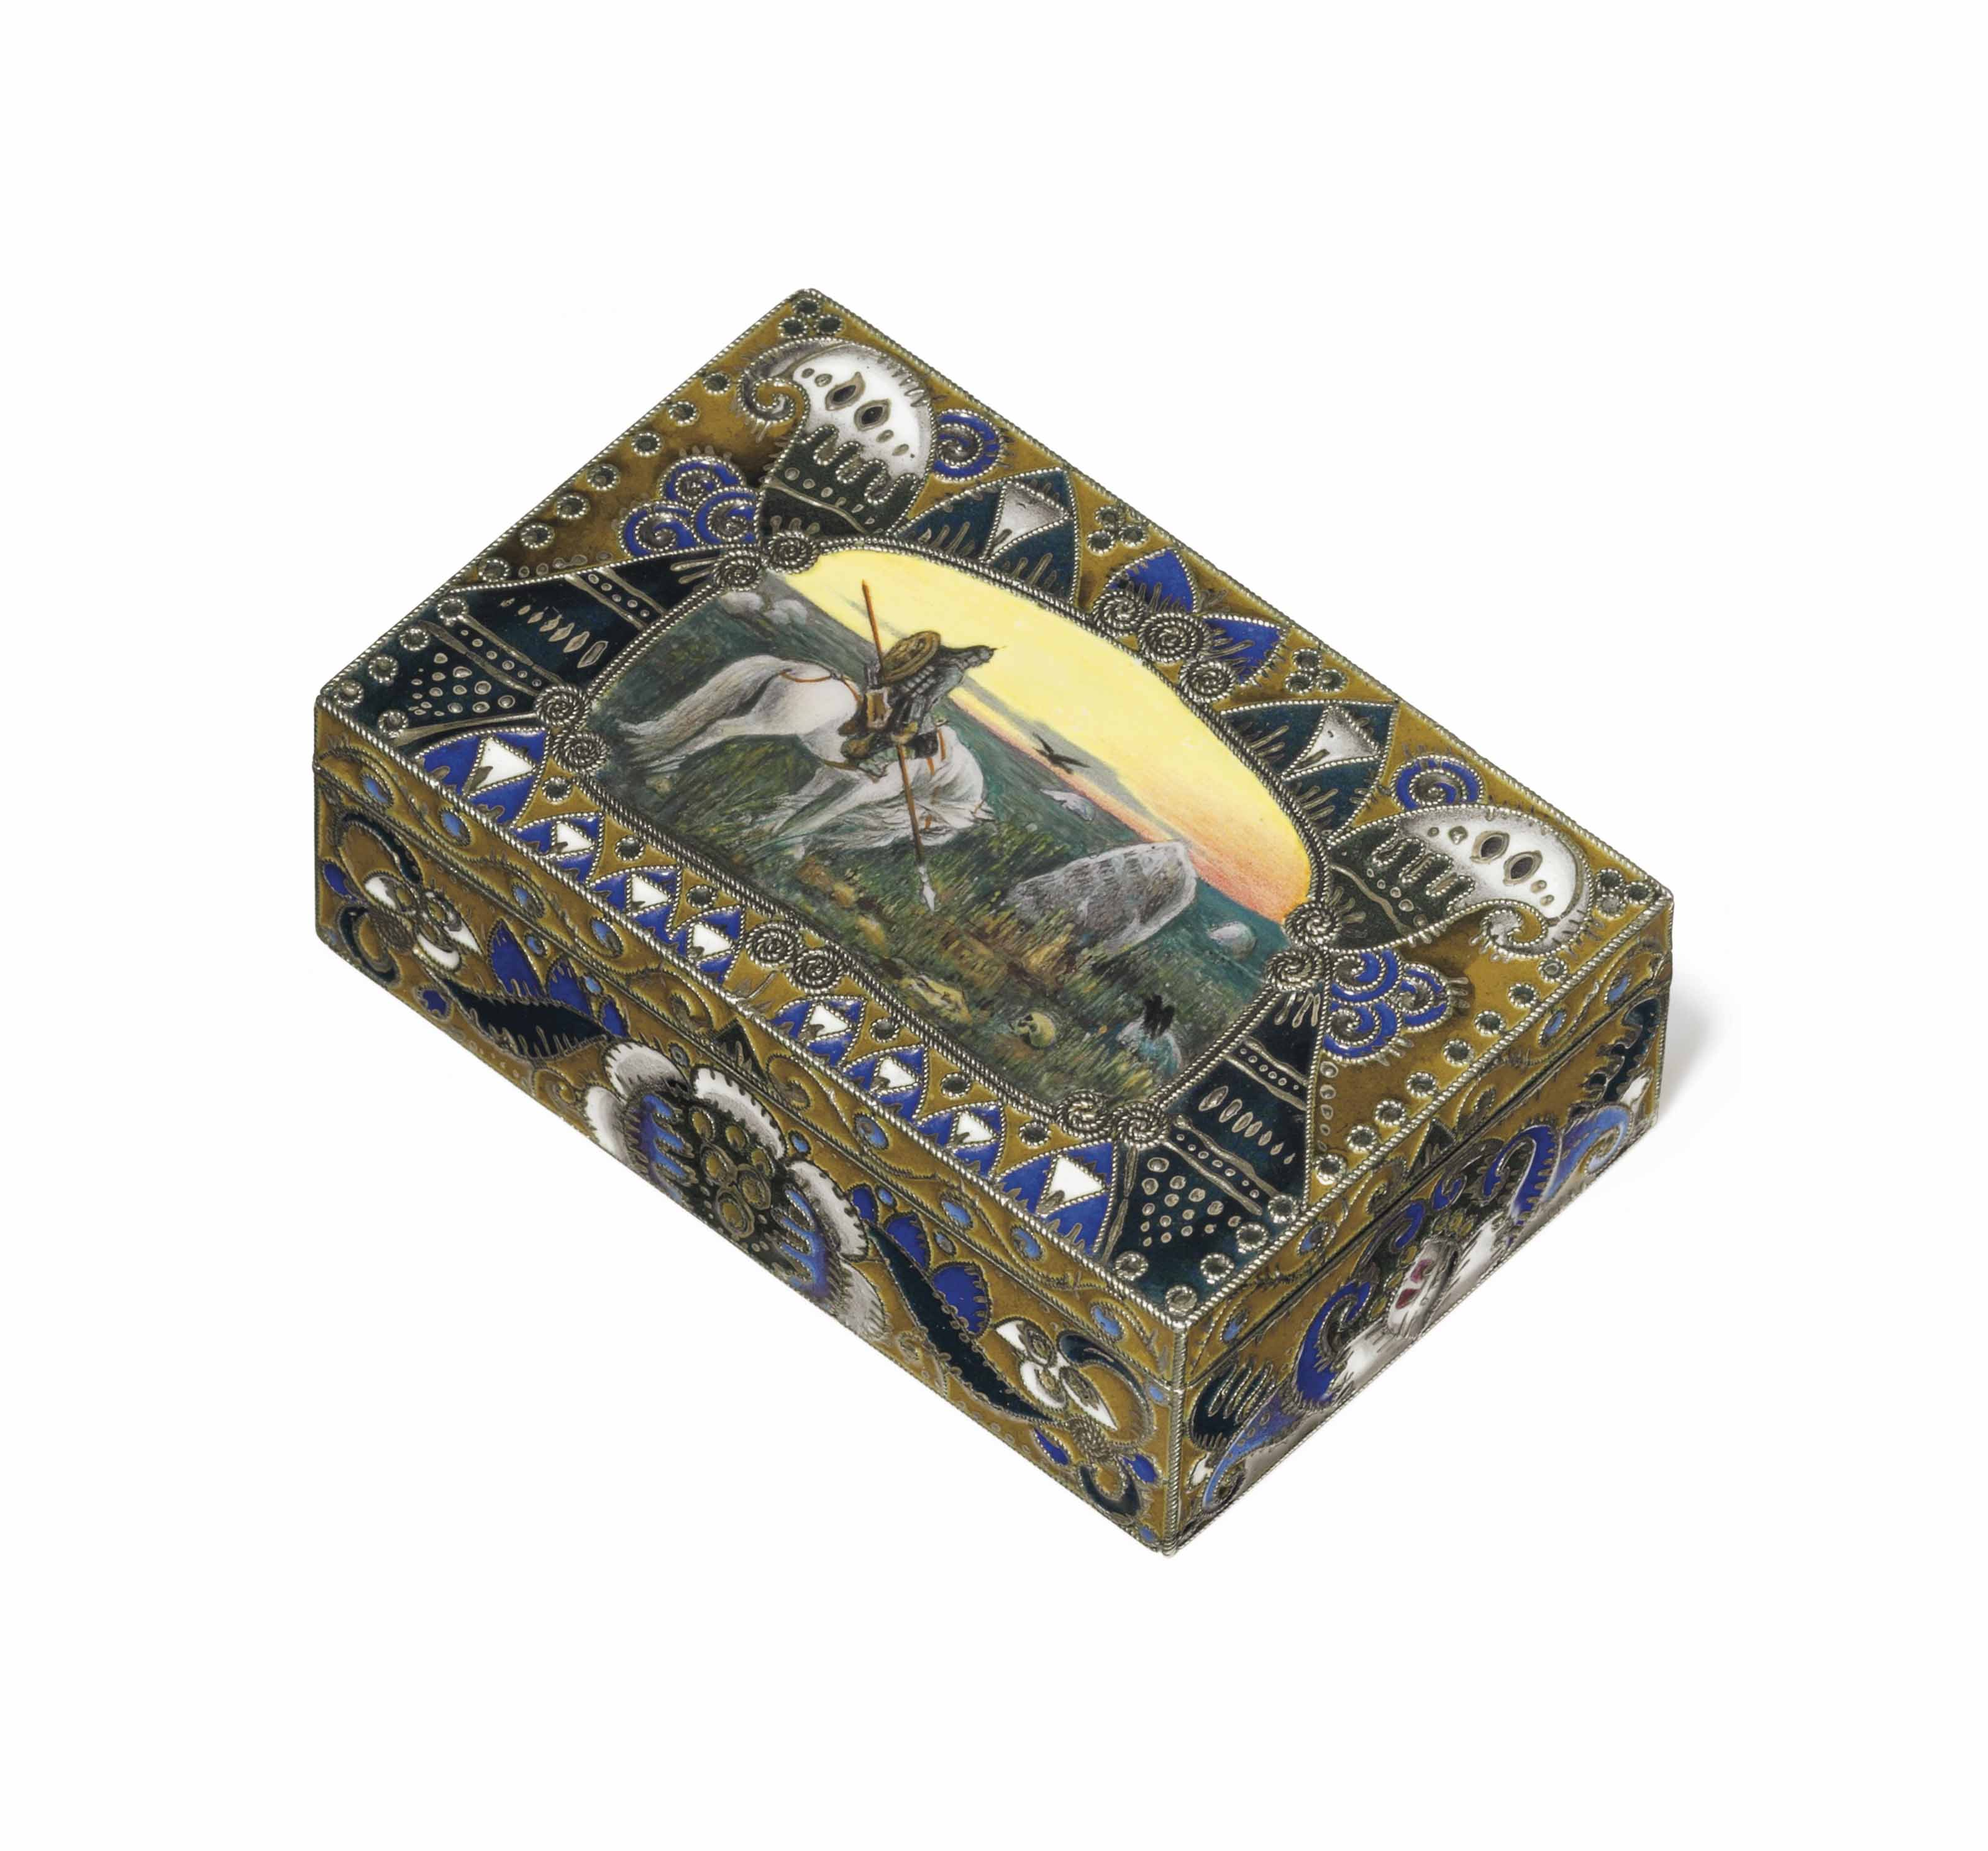 A SILVER-GILT CLOISONNÉ AND EN PLEIN ENAMEL BOX